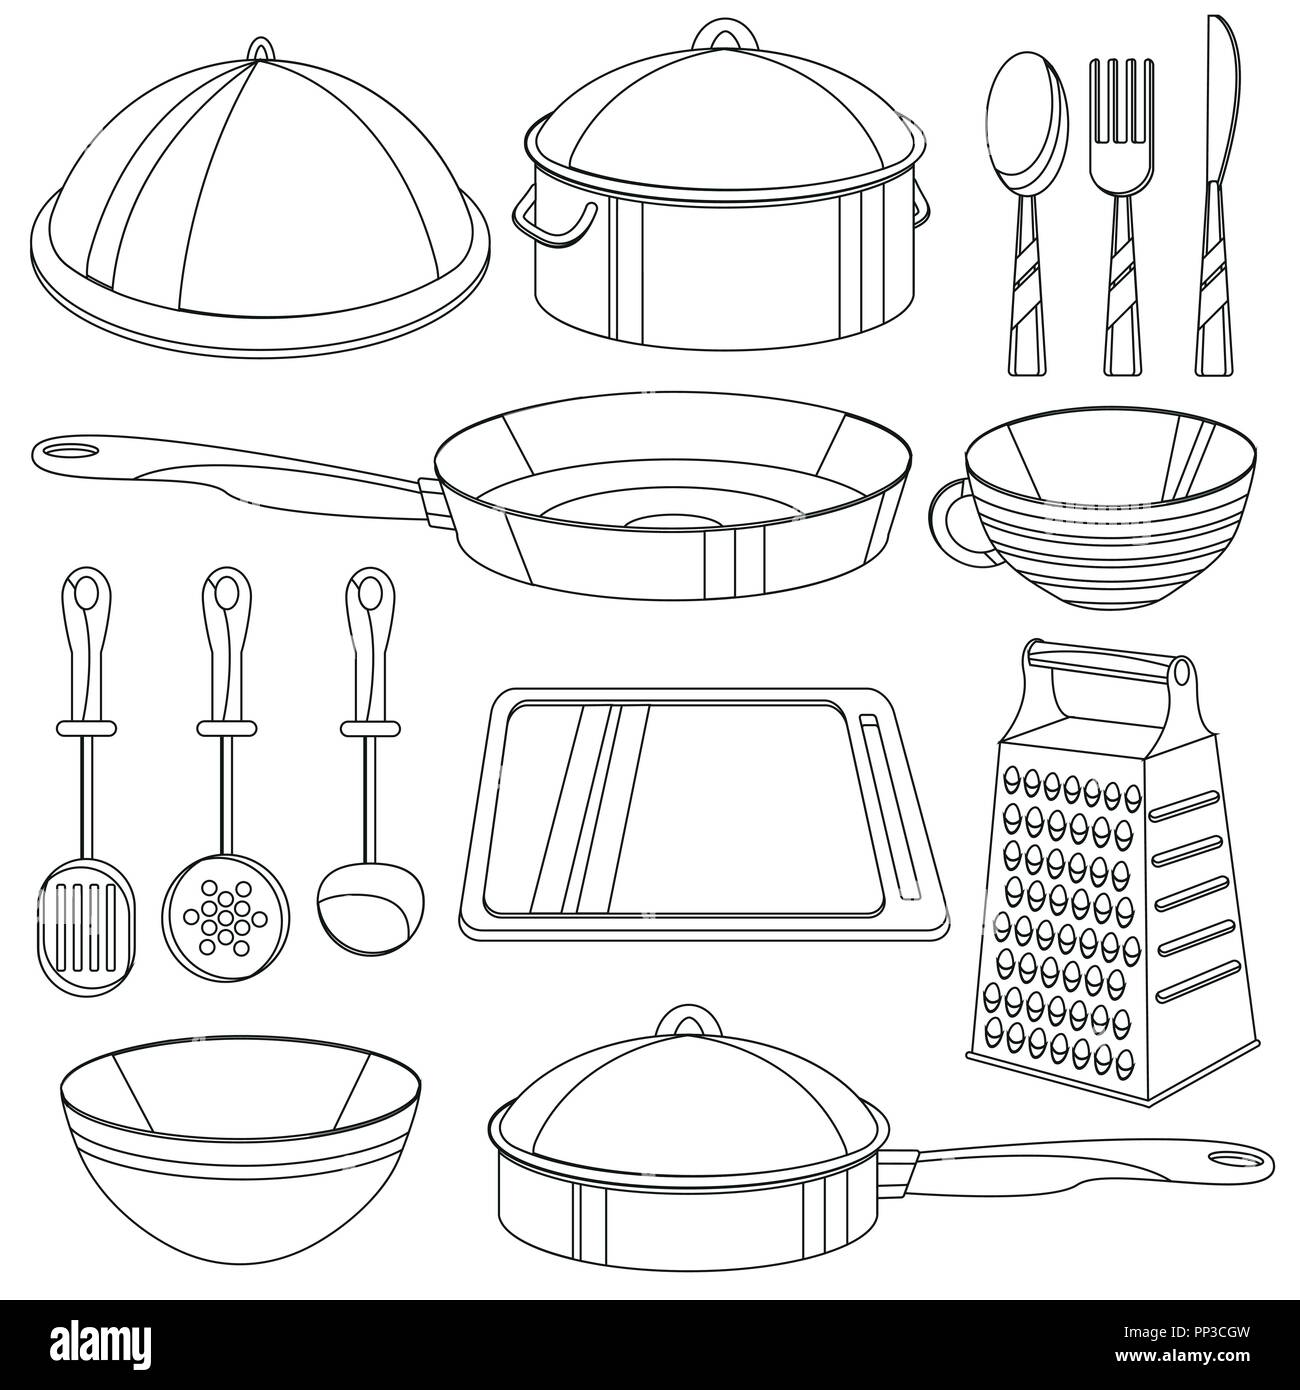 Kuchenutensilien Malbuch Vector Illustration Fur Kinder Stock Vektorgrafik Alamy